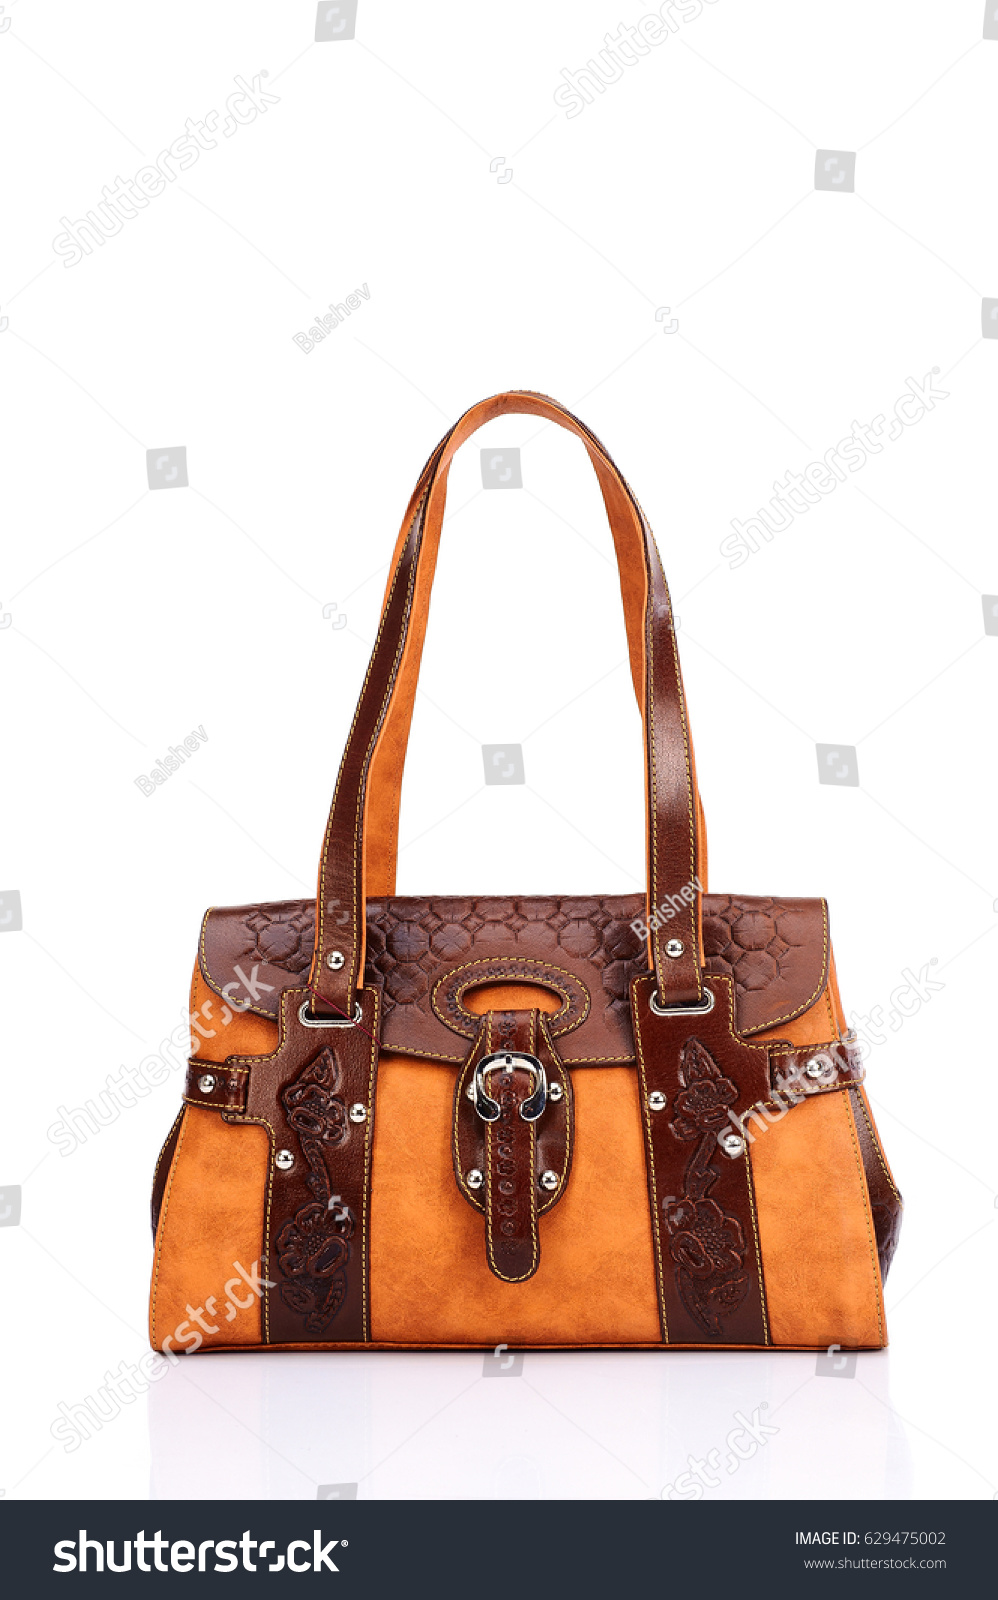 fb9e5b406f Leather Ladies Bag On White Background Stock Photo (Edit Now ...